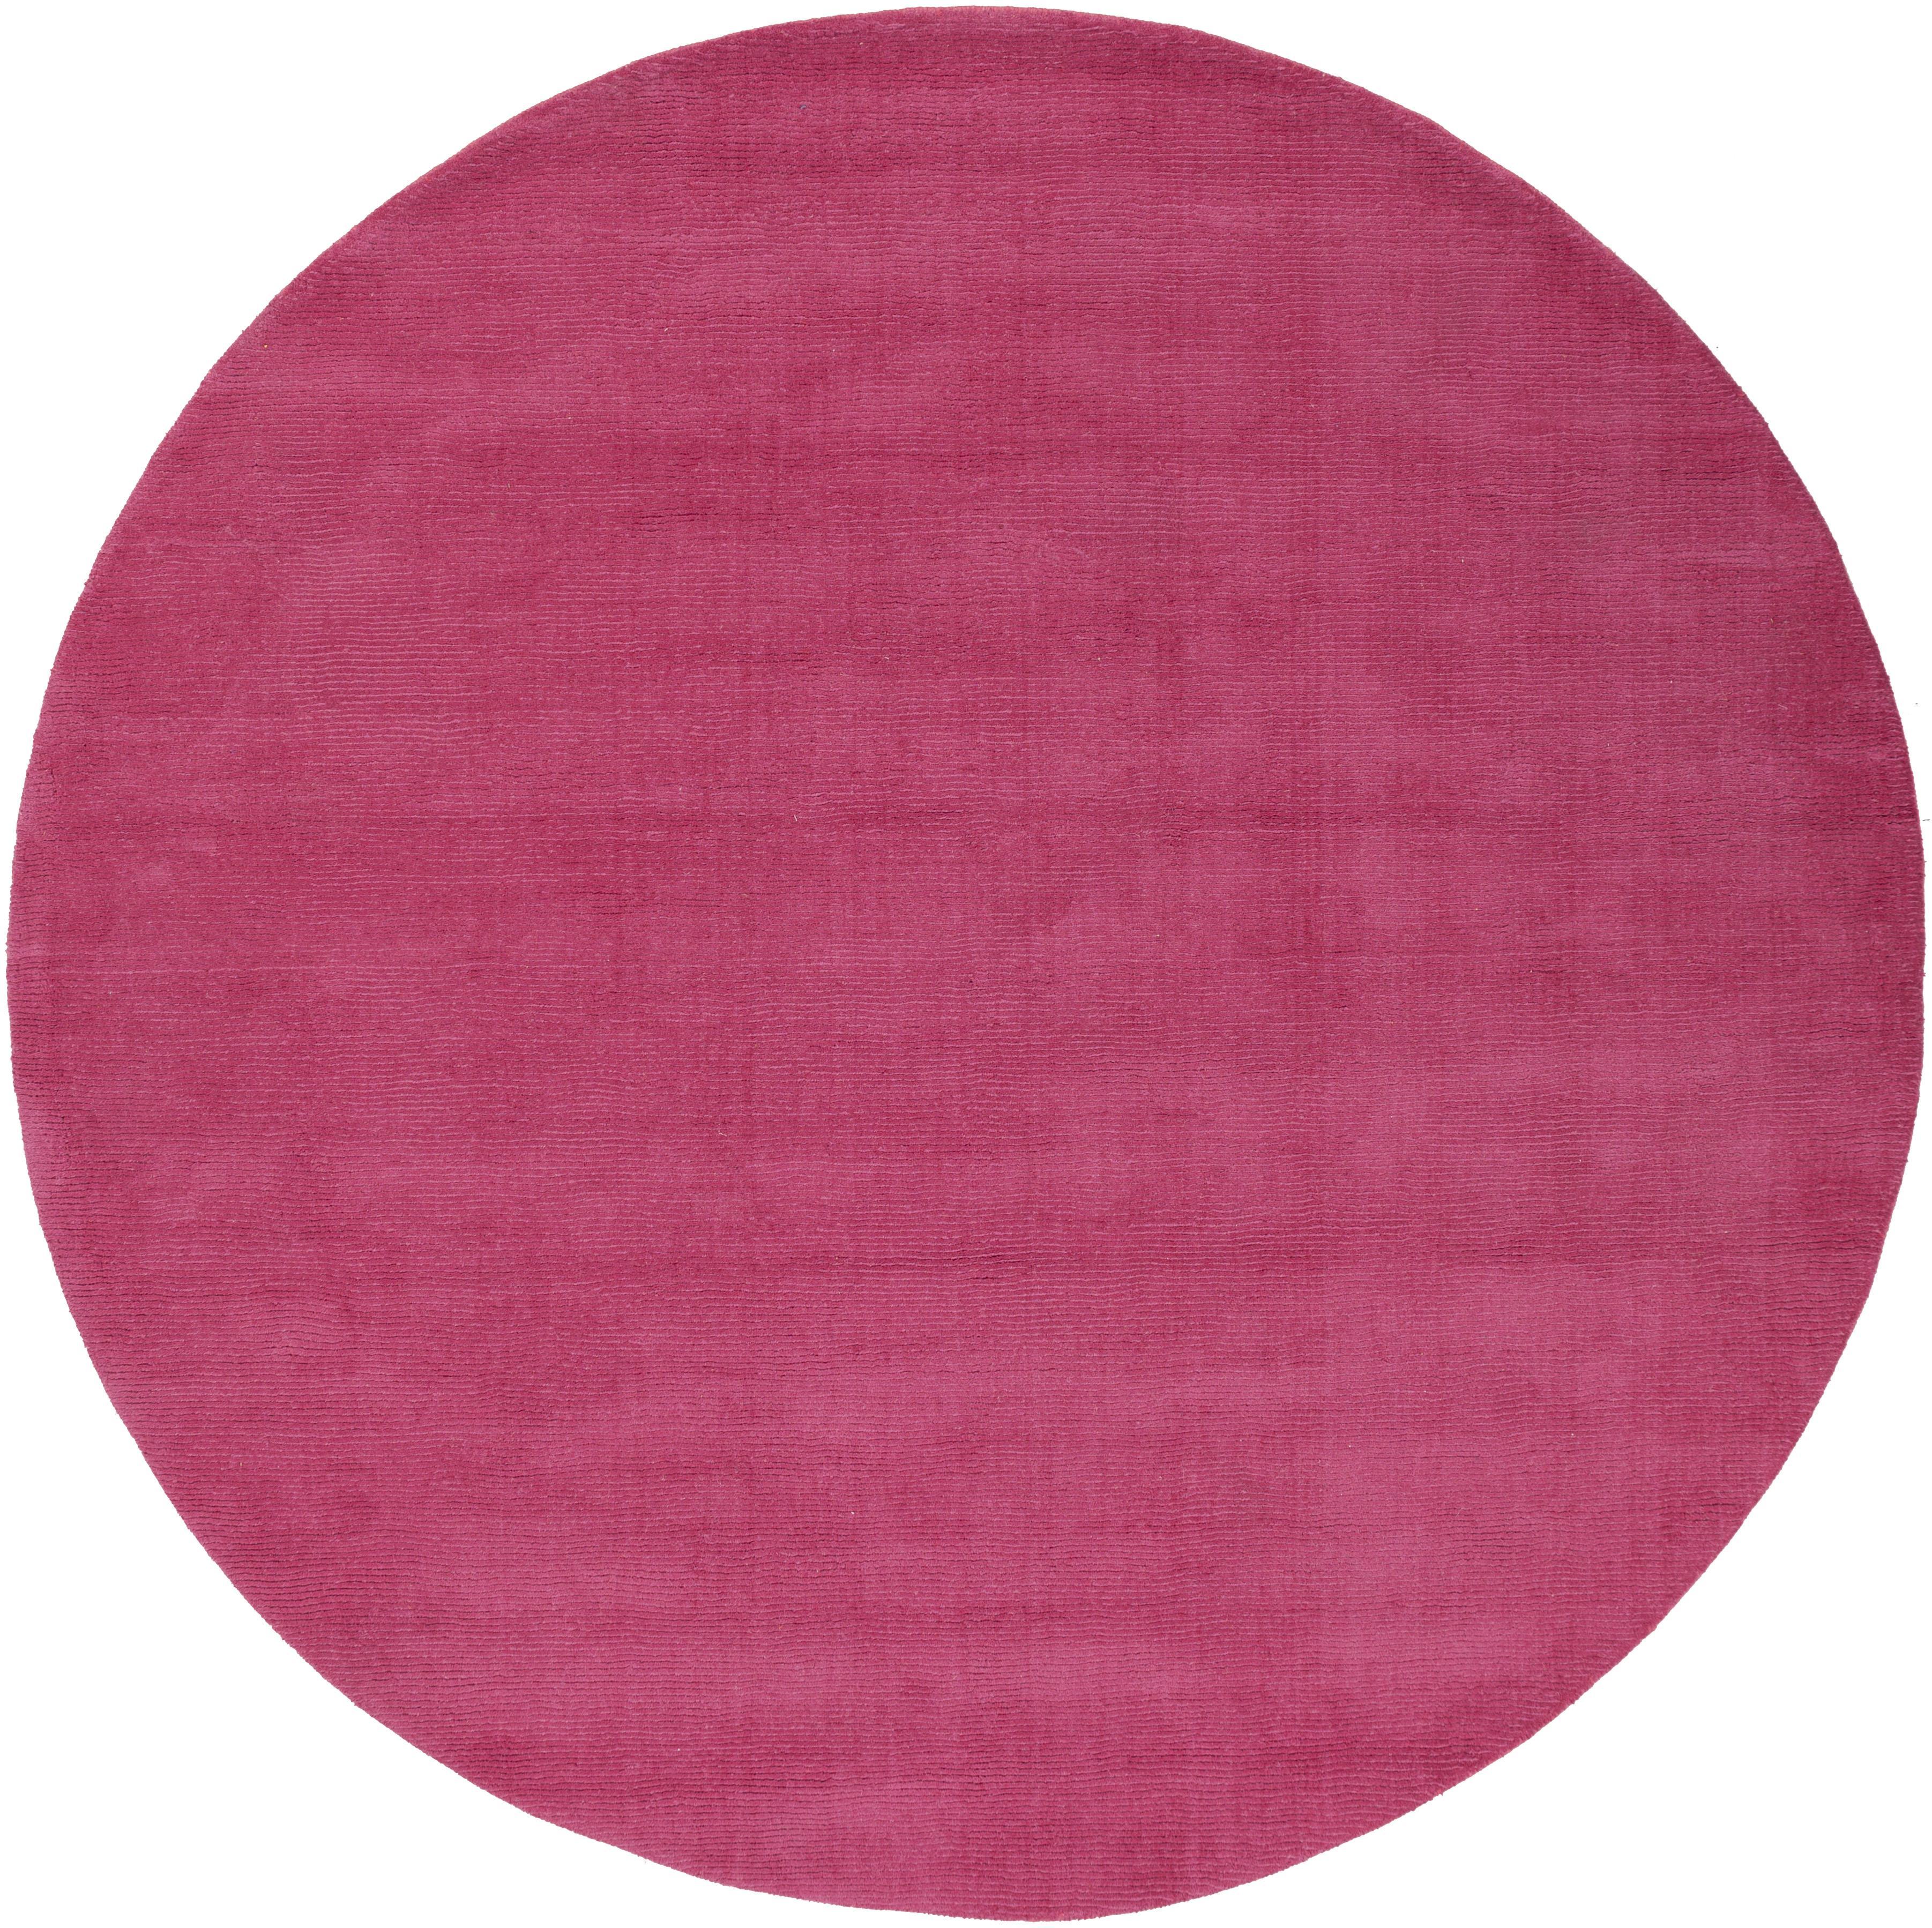 Surya Rugs Mystique 8' Round - Item Number: M5327-8RD